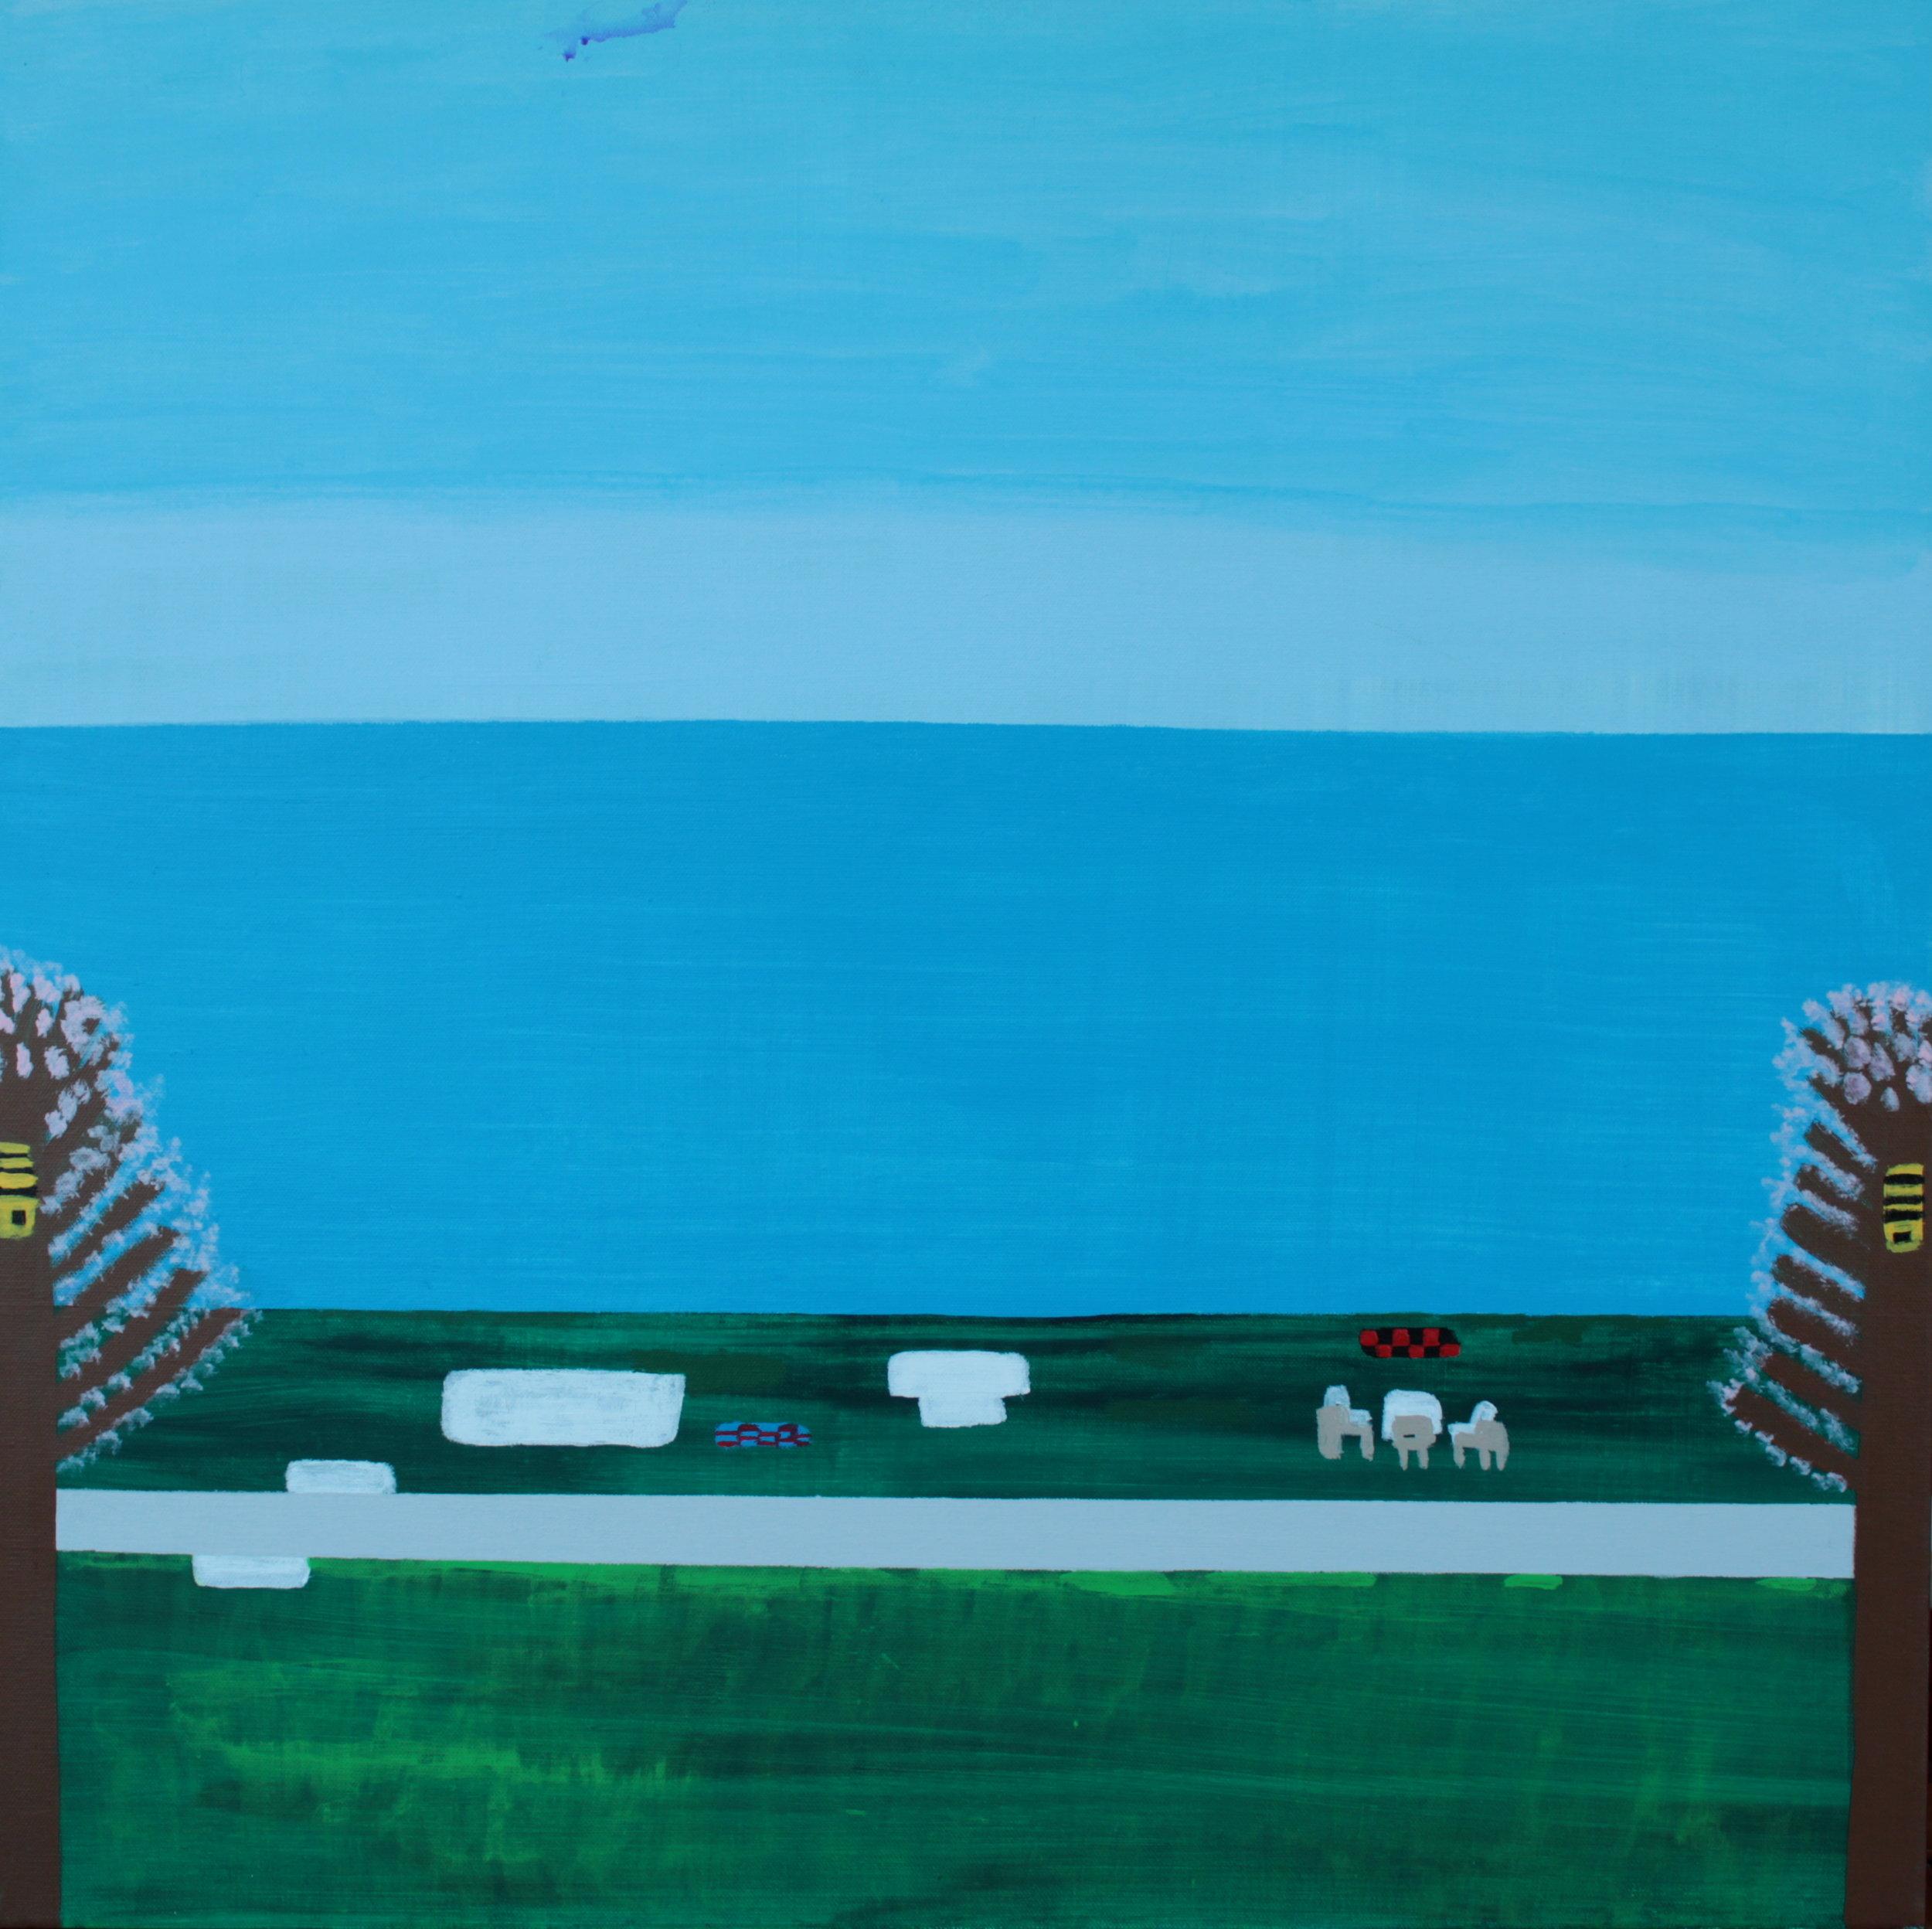 7 2014 In Bee Tween Acrylic on Canvas 76 X 76cm Yaniv Janson.JPG